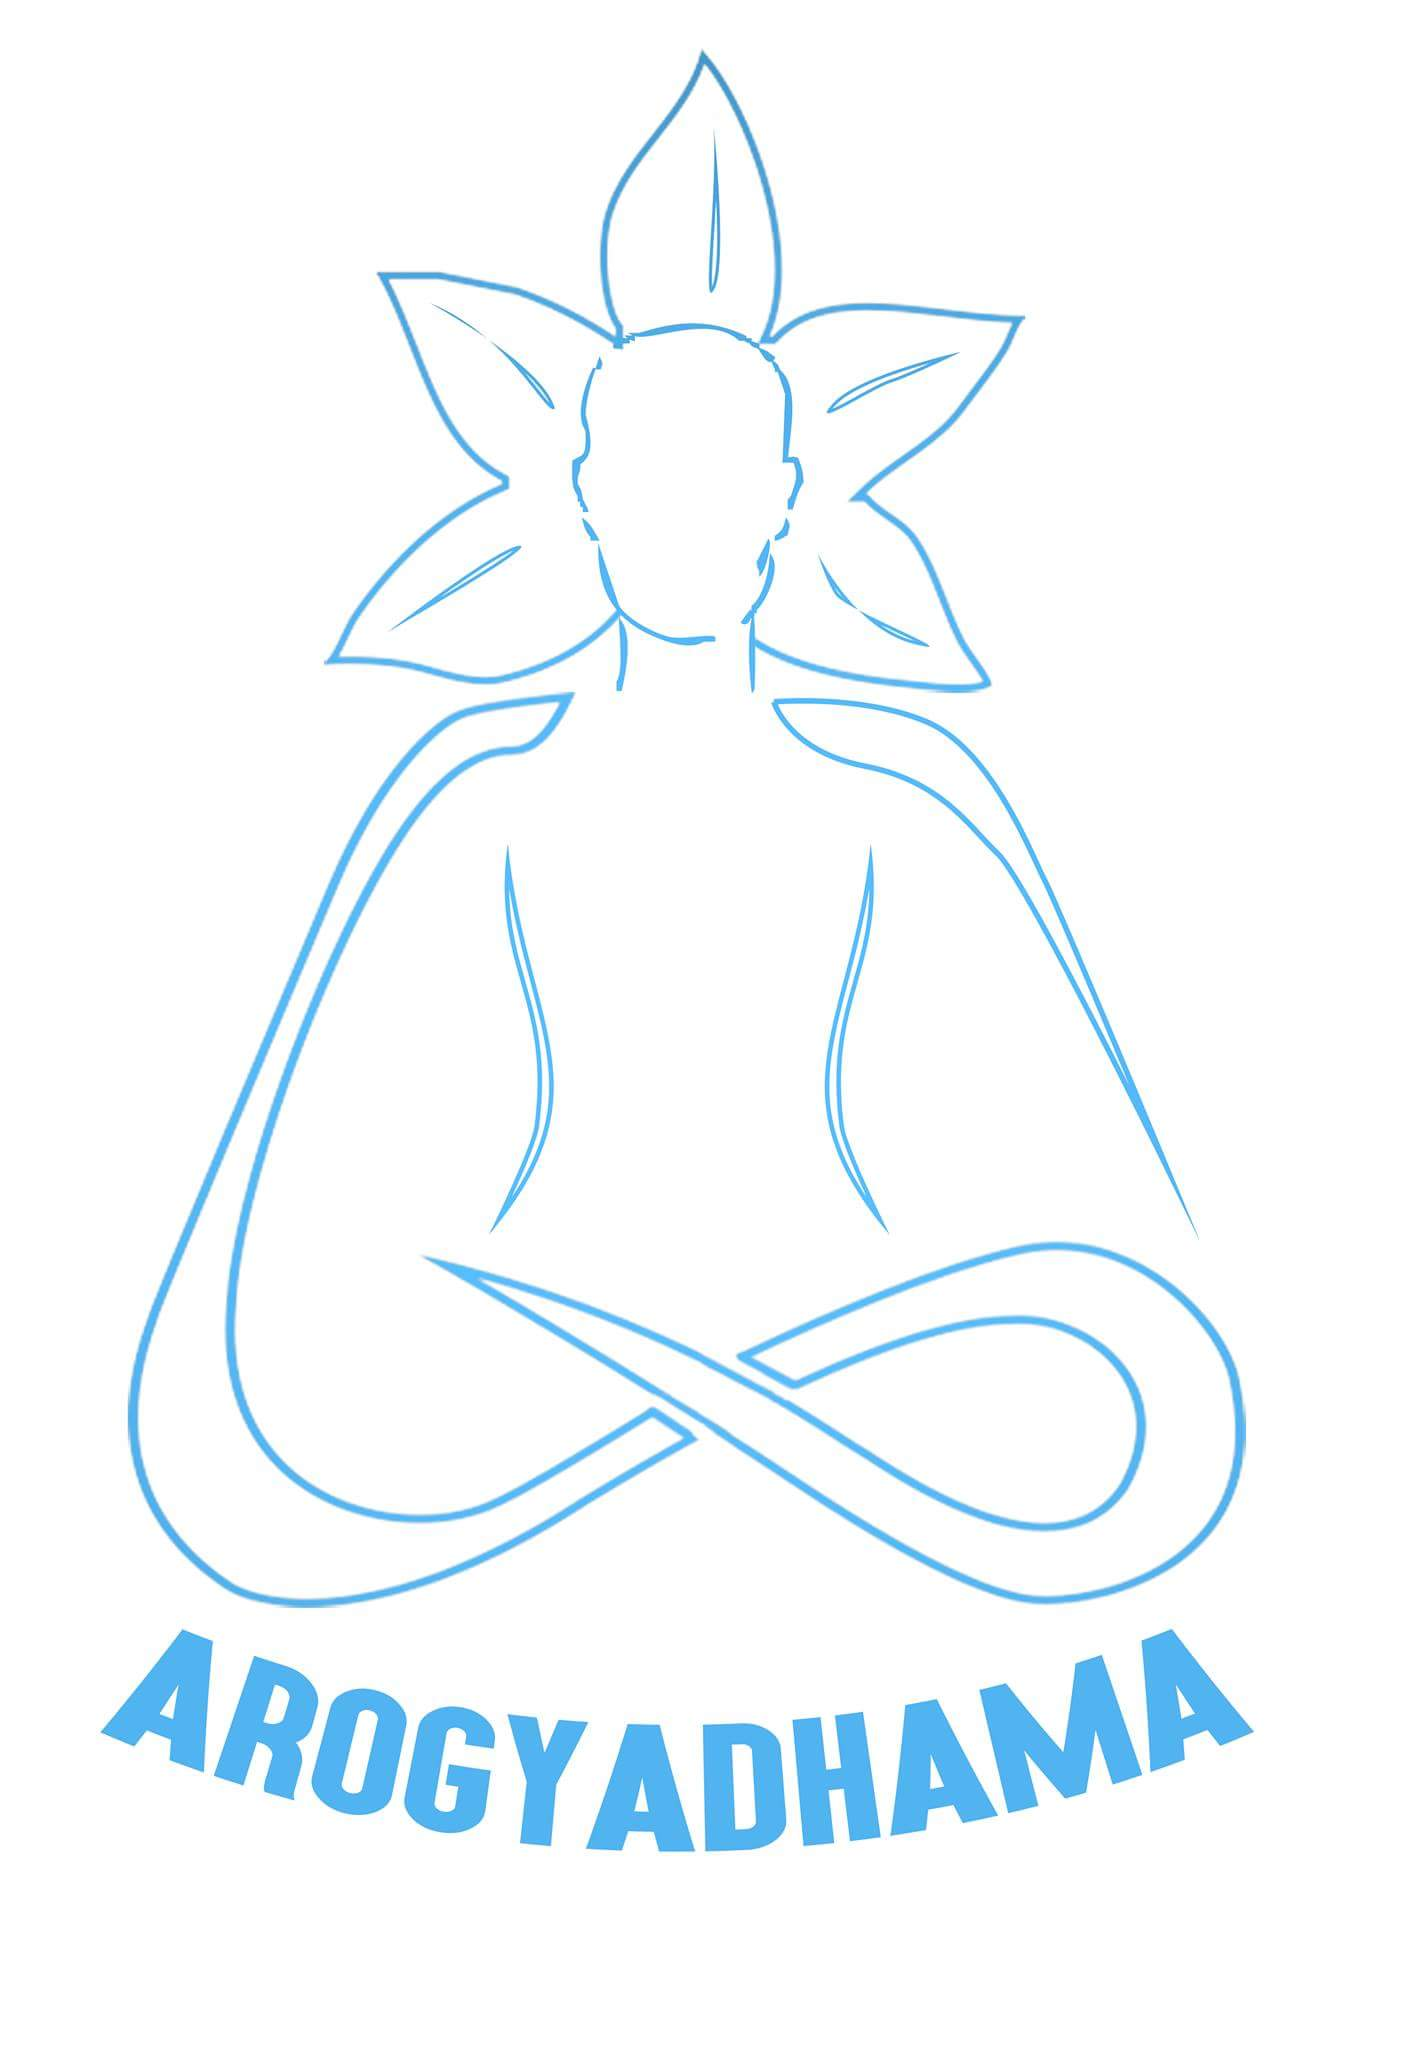 Arogyadhama Naturopathy and Yoga Clinic